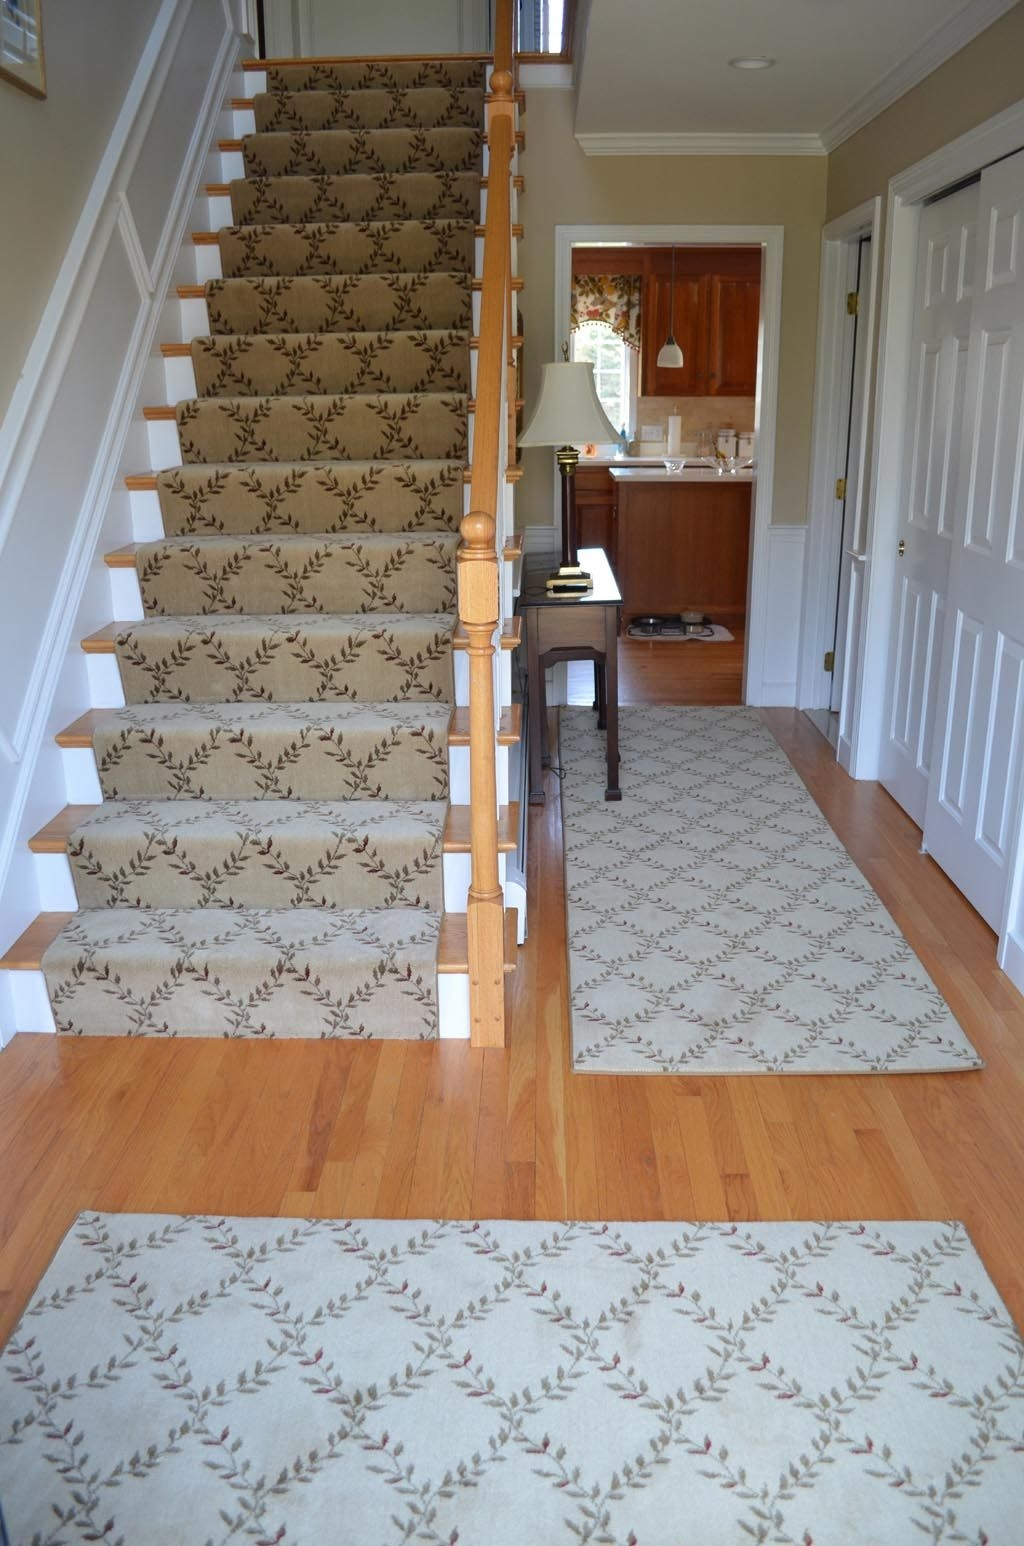 Wood Stair Carpet Runners Carpets Pinterest Stair | Carpet Runners For Carpeted Stairs